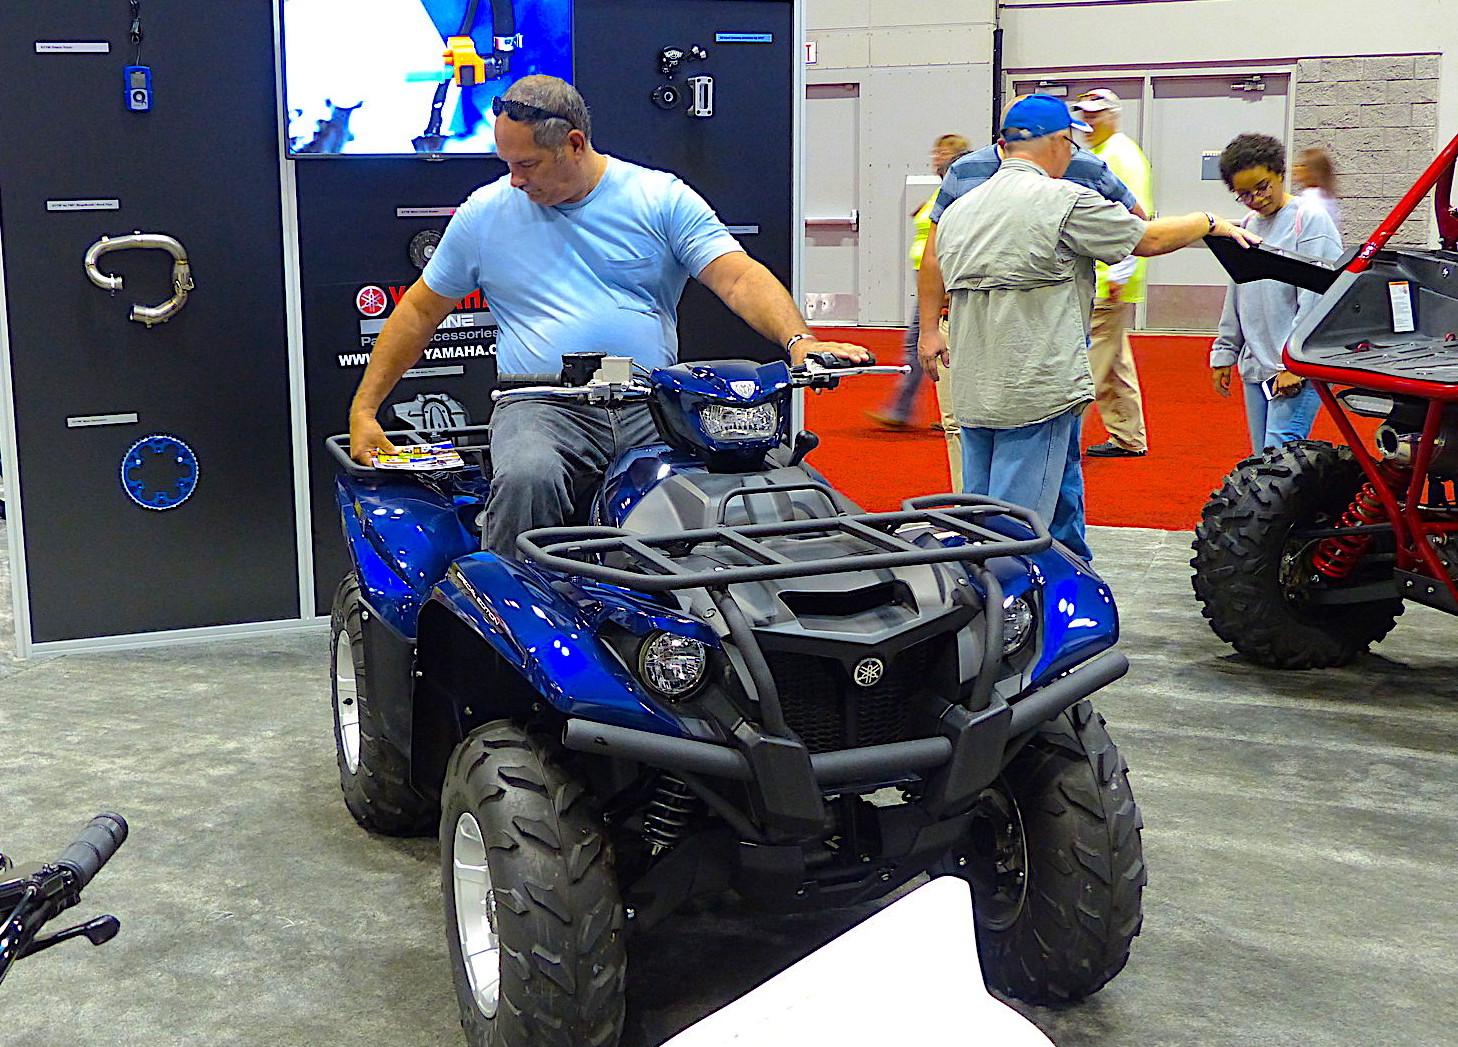 Yamaha ATV Display at AIMExpo